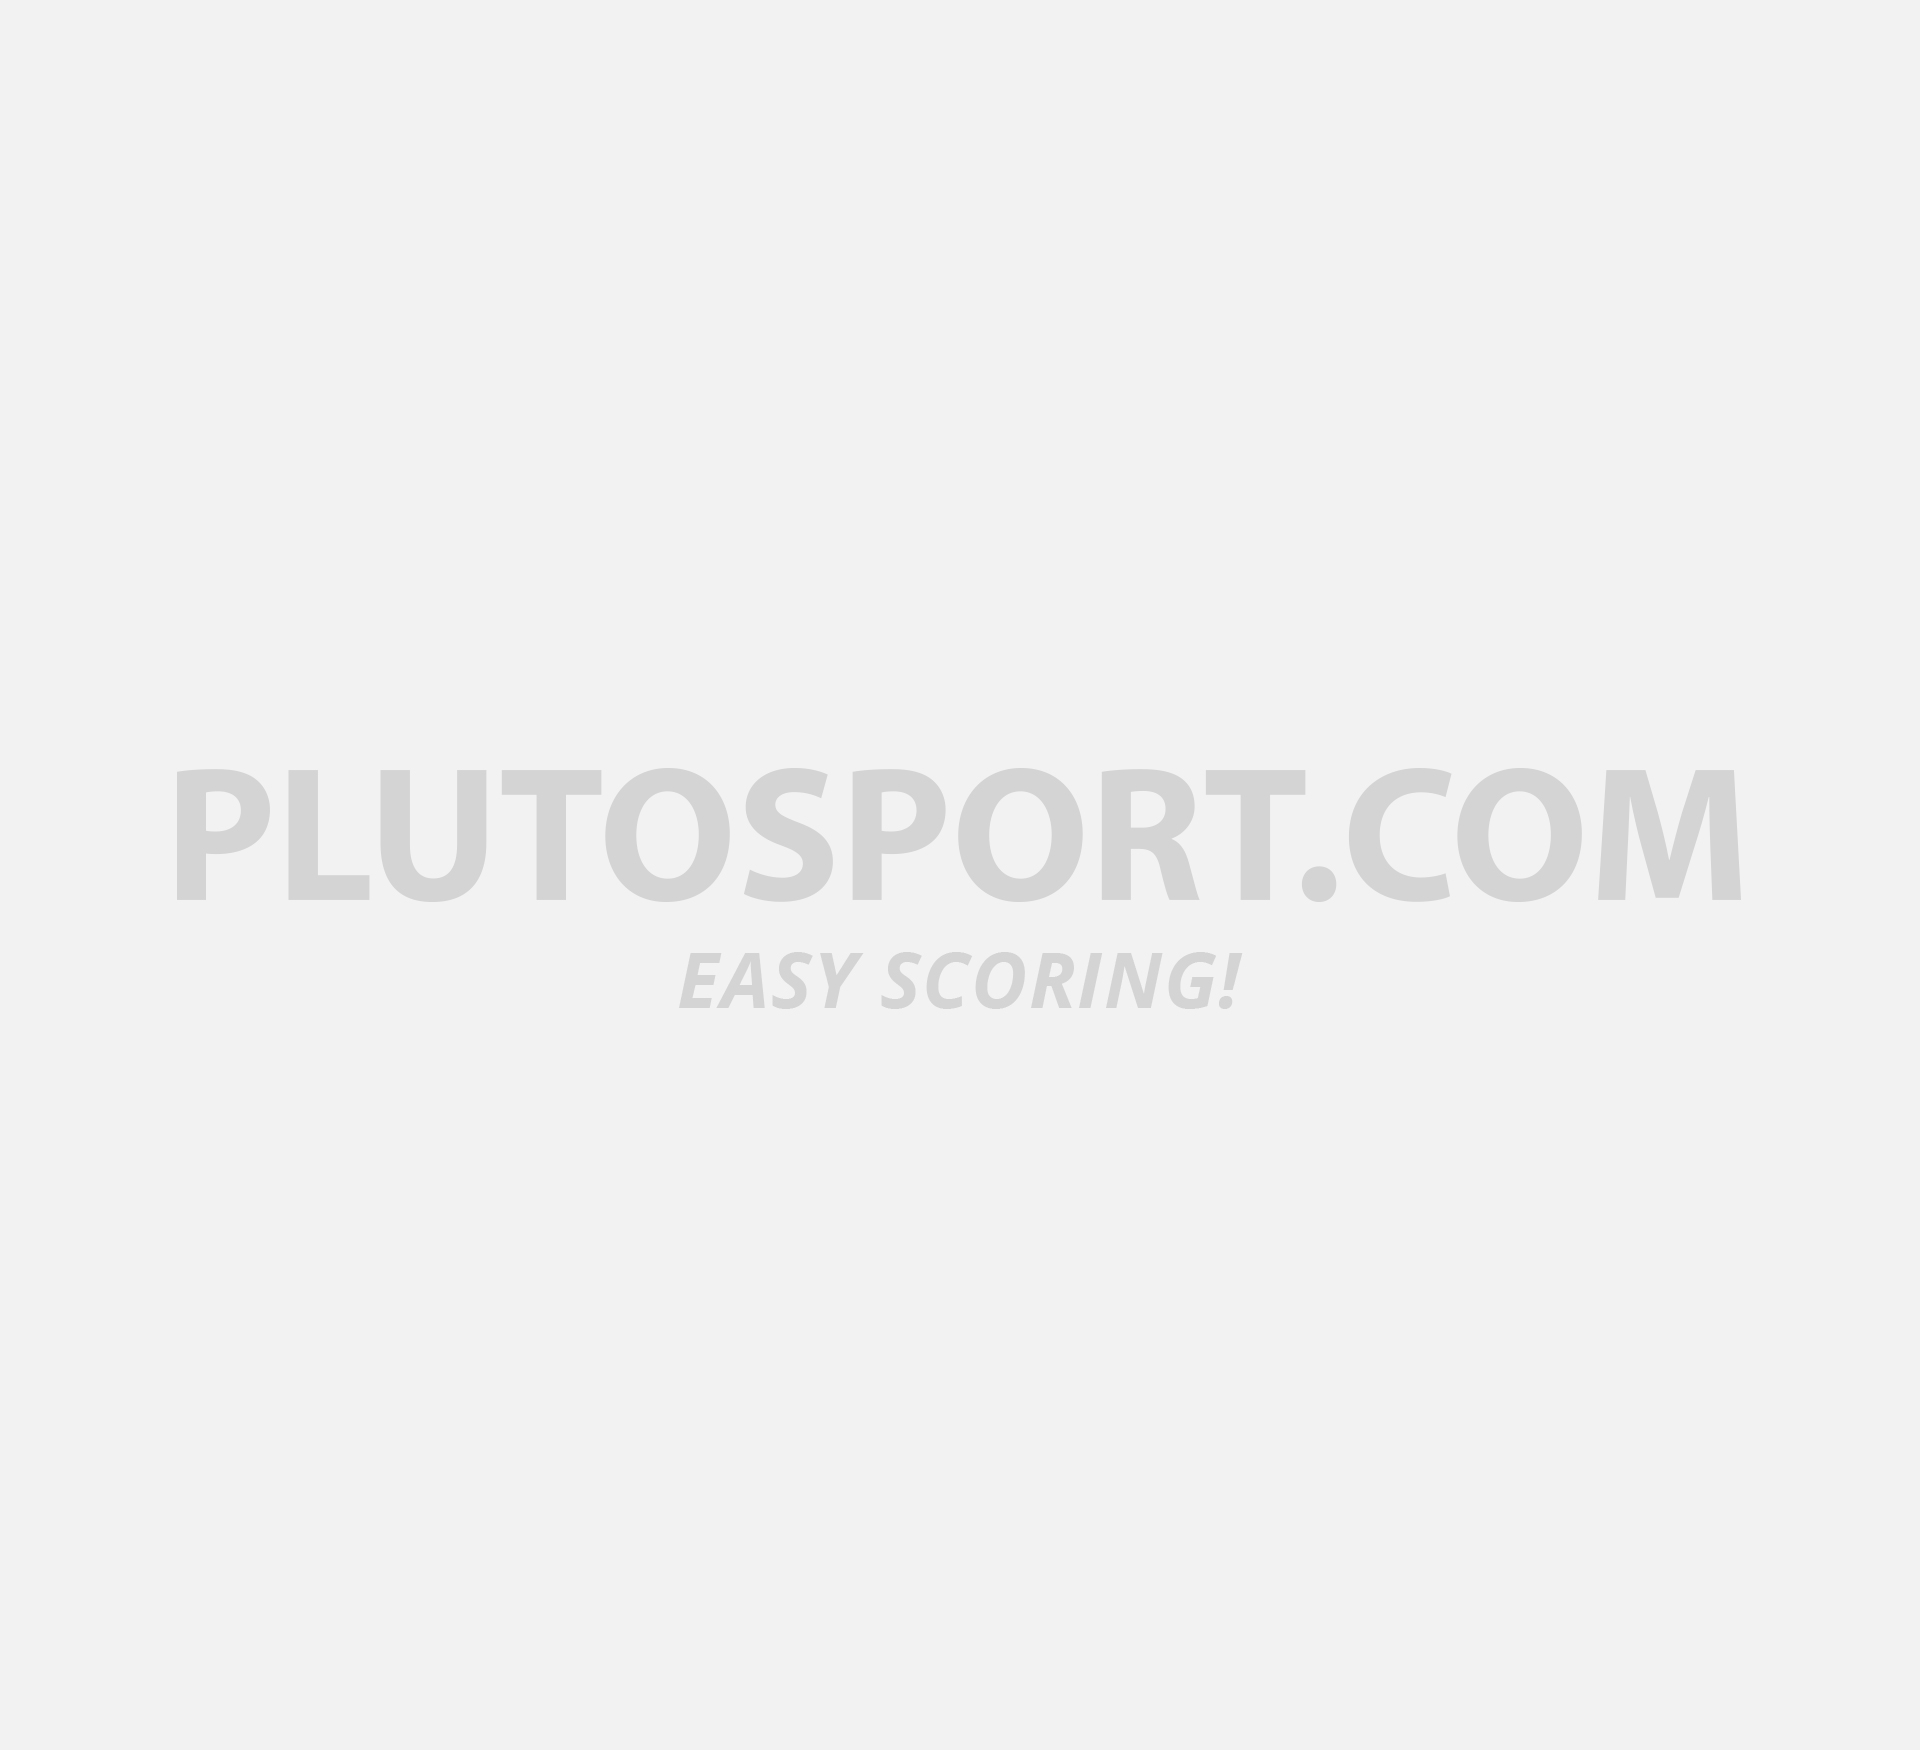 438f7774dfa Cavello Boxer Shorts 2-pack - Underwear - Clothing - Lifestyle ...